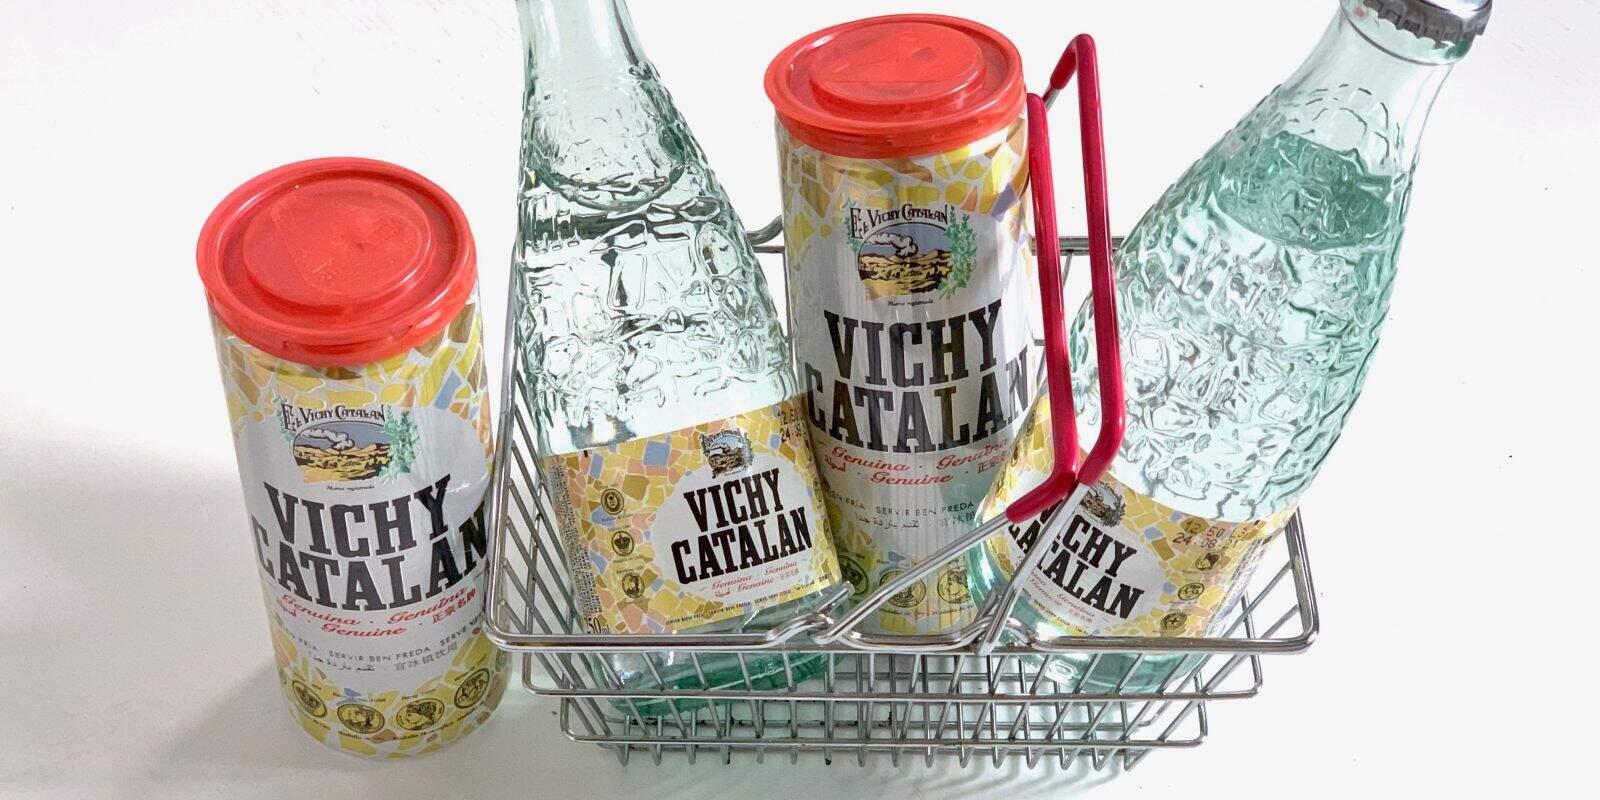 Diferents productes de Vichy Catalan Corporation